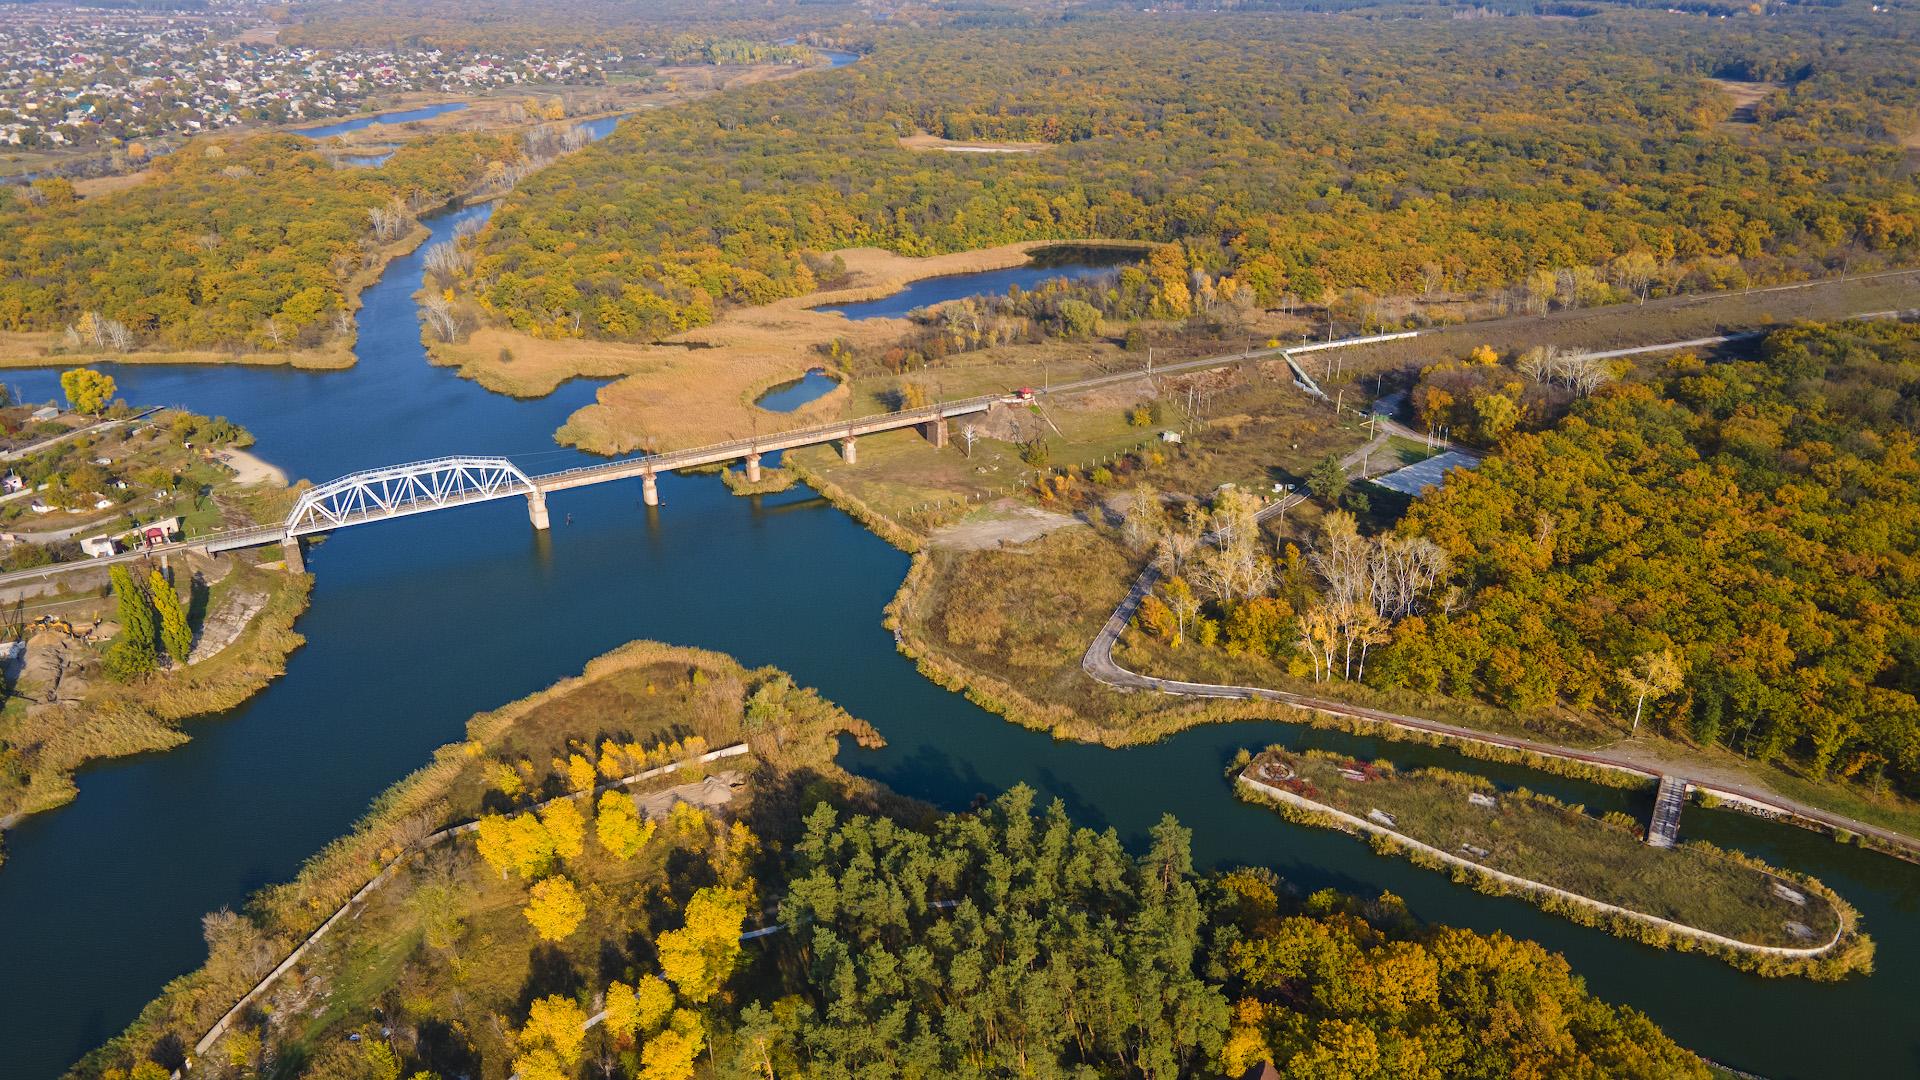 ЖД-мост через Самару в районе Вороновки, октябрь 2020